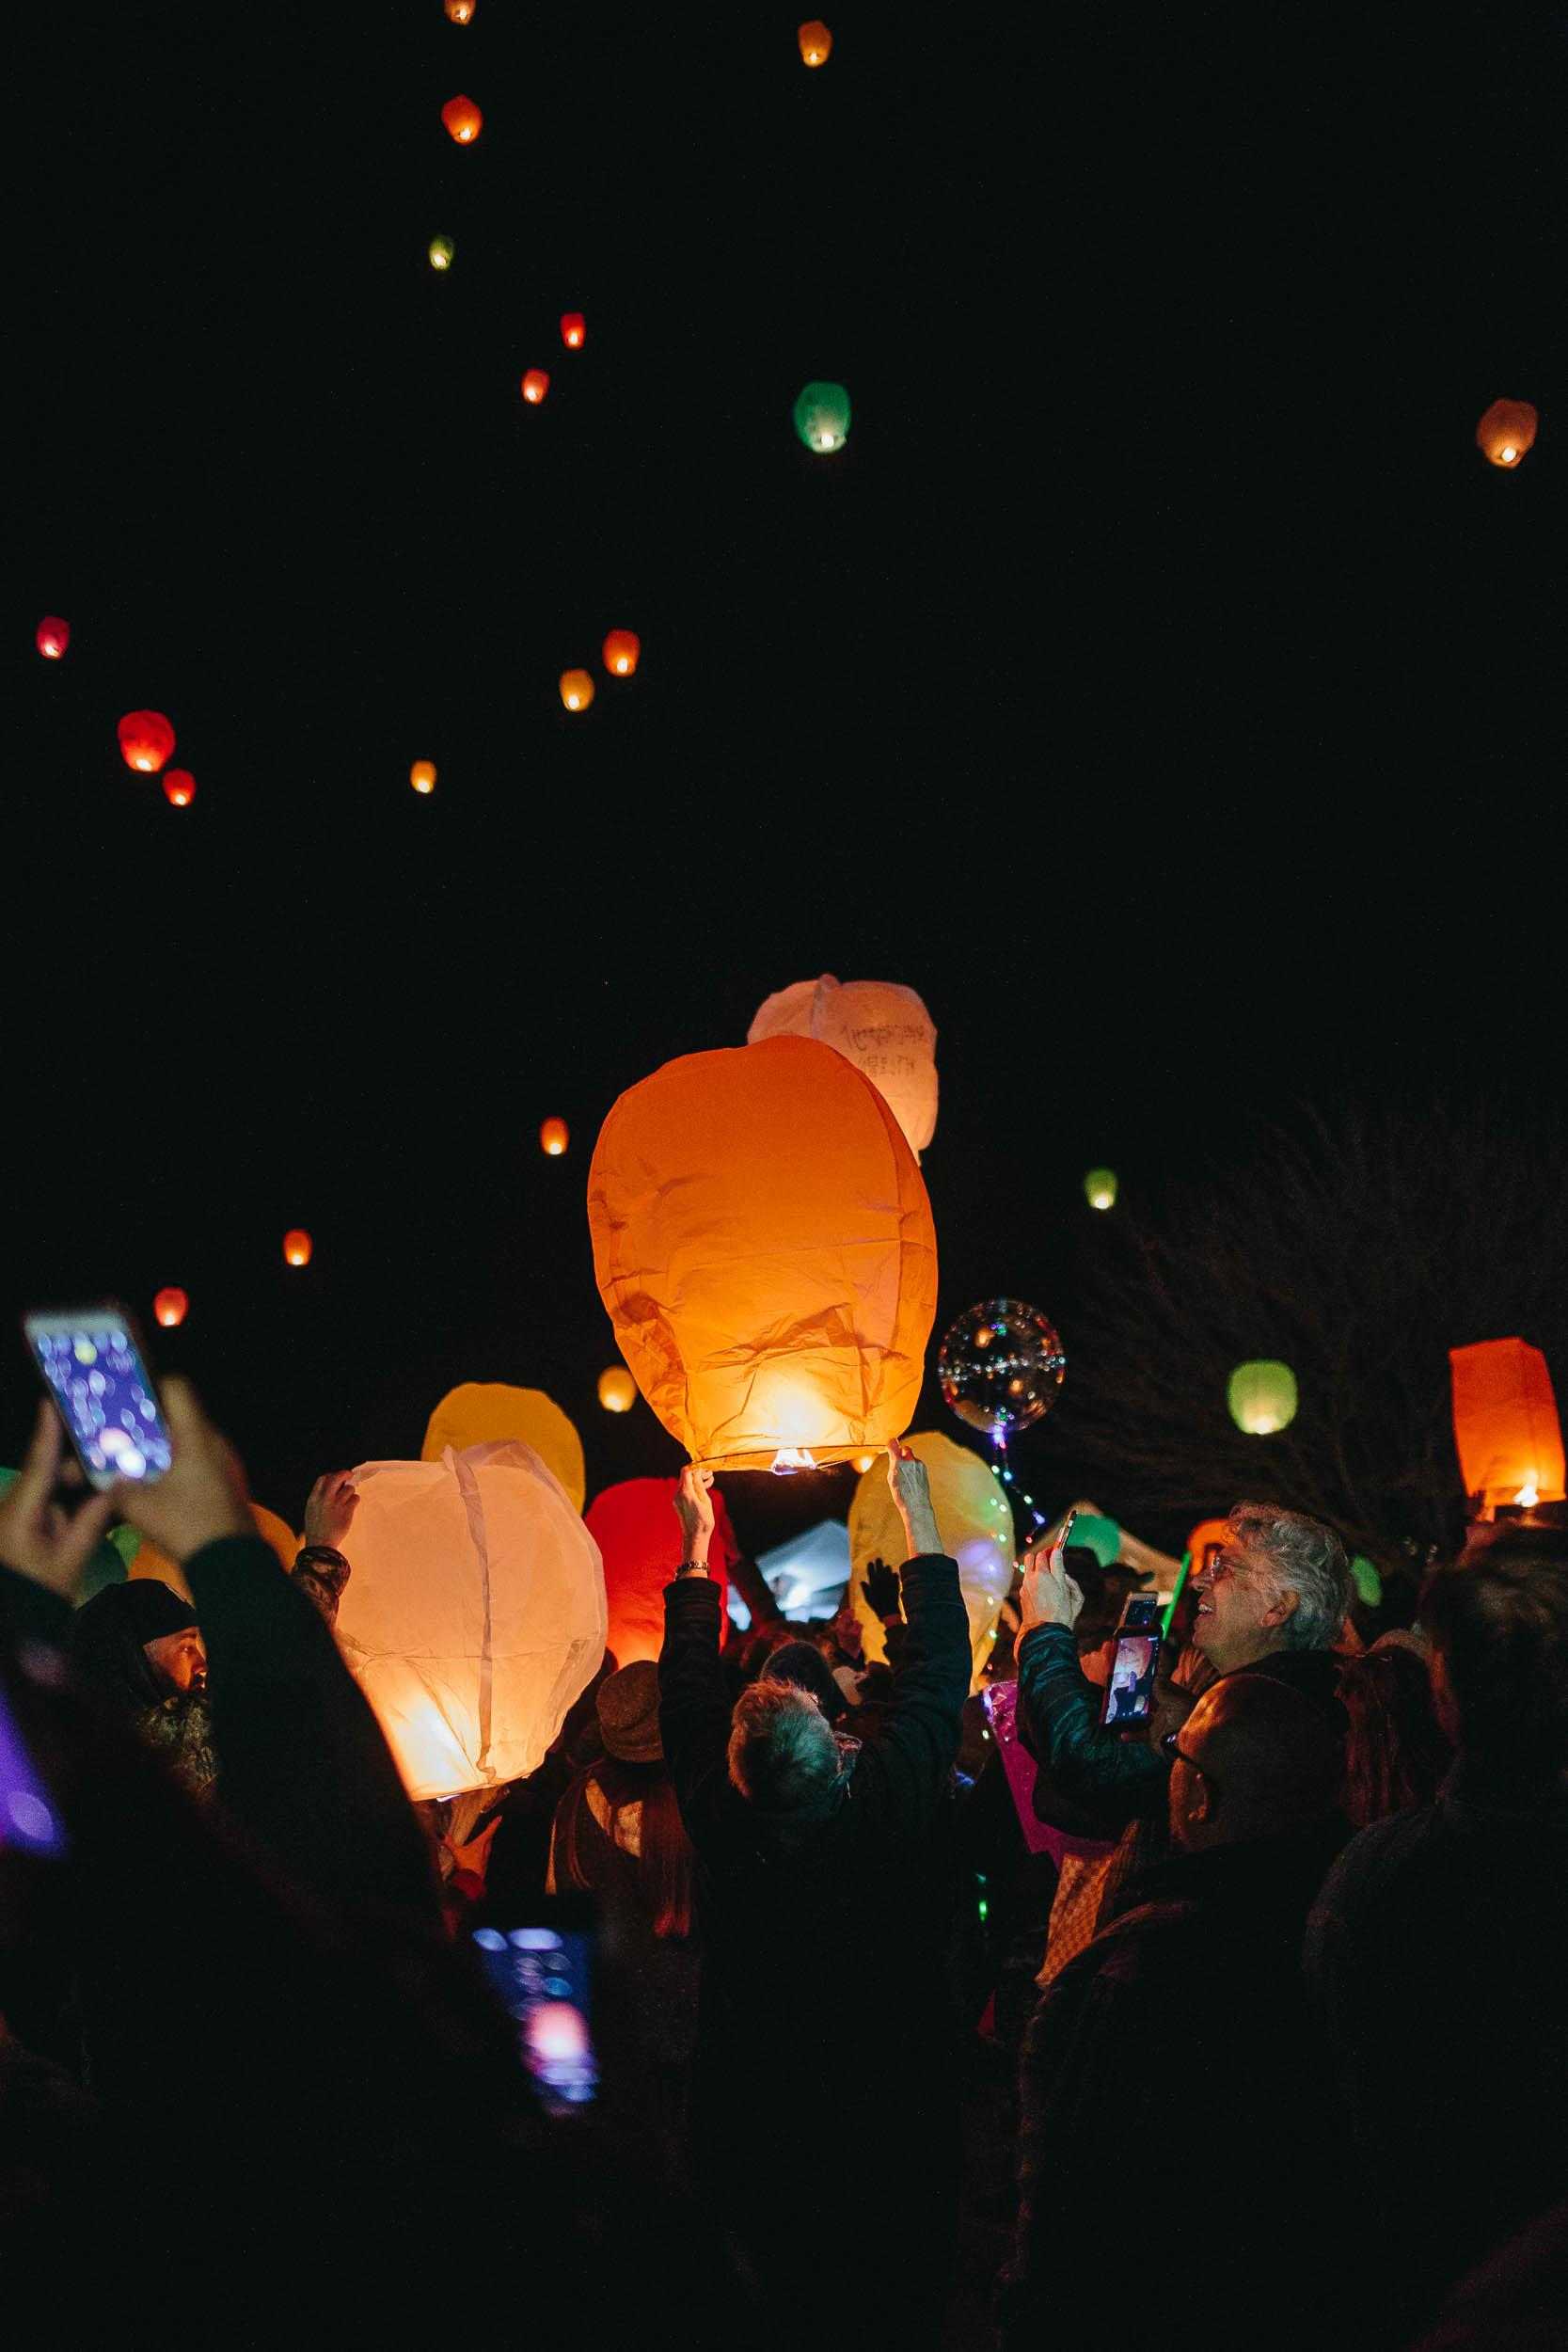 Kyle-Sheppard-Kanab-Balloon-Festival-56.jpg